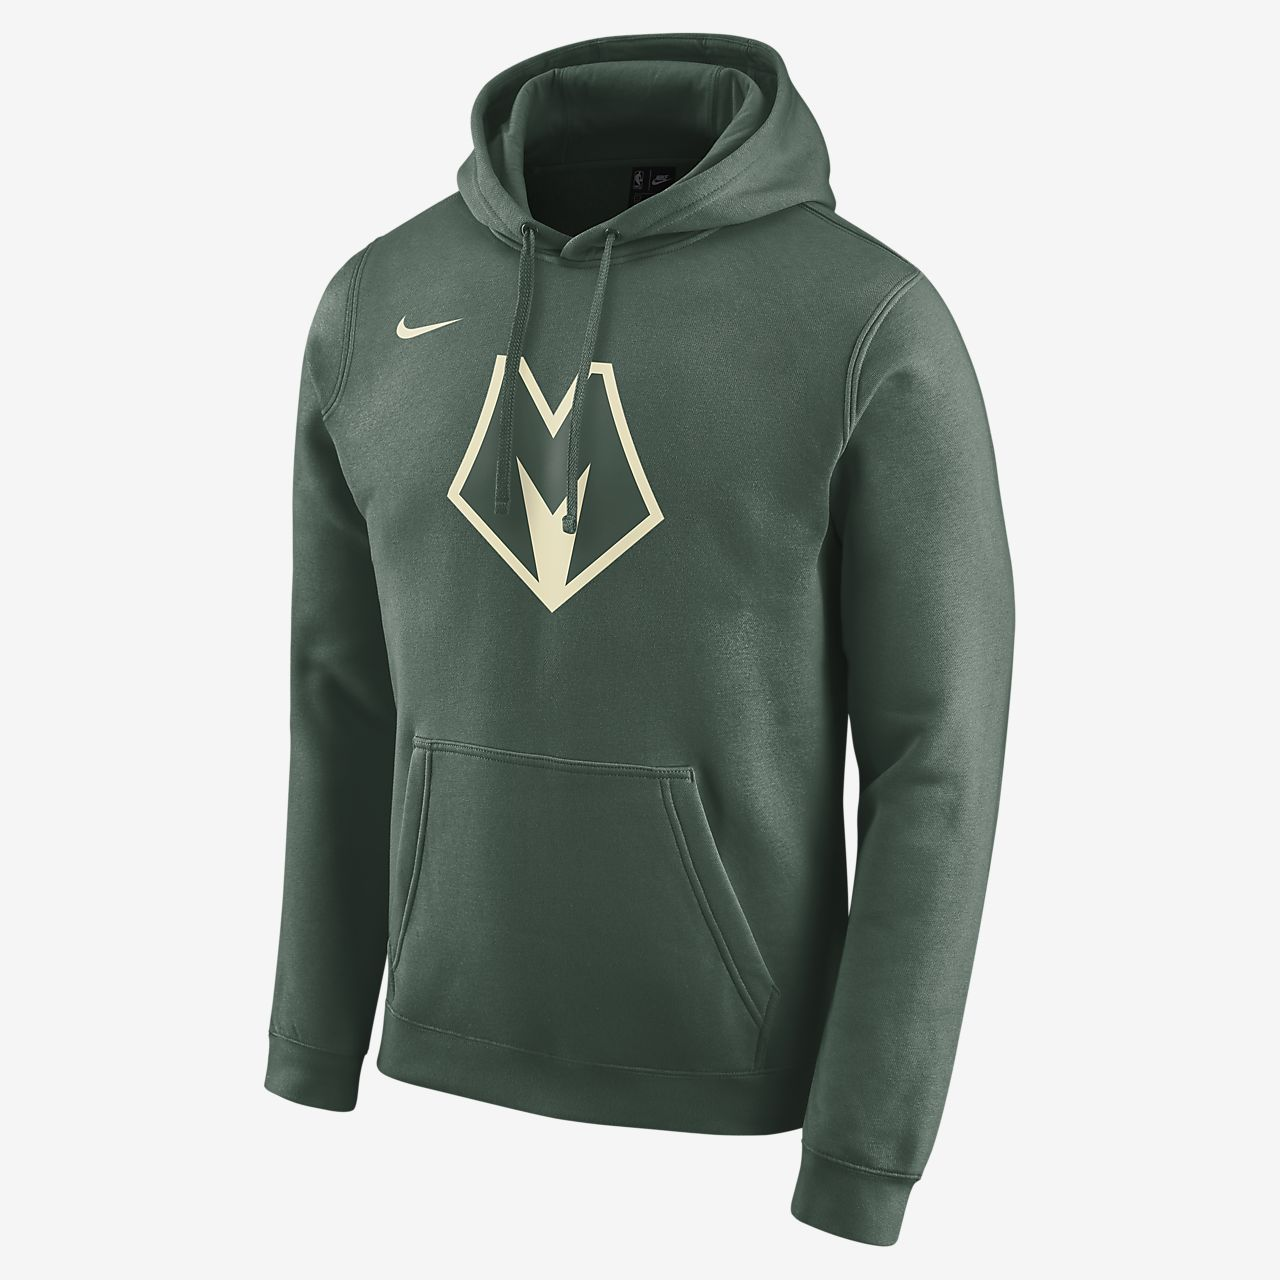 Sudadera con capucha Nike NBA para hombre Bucks City Edition Logo